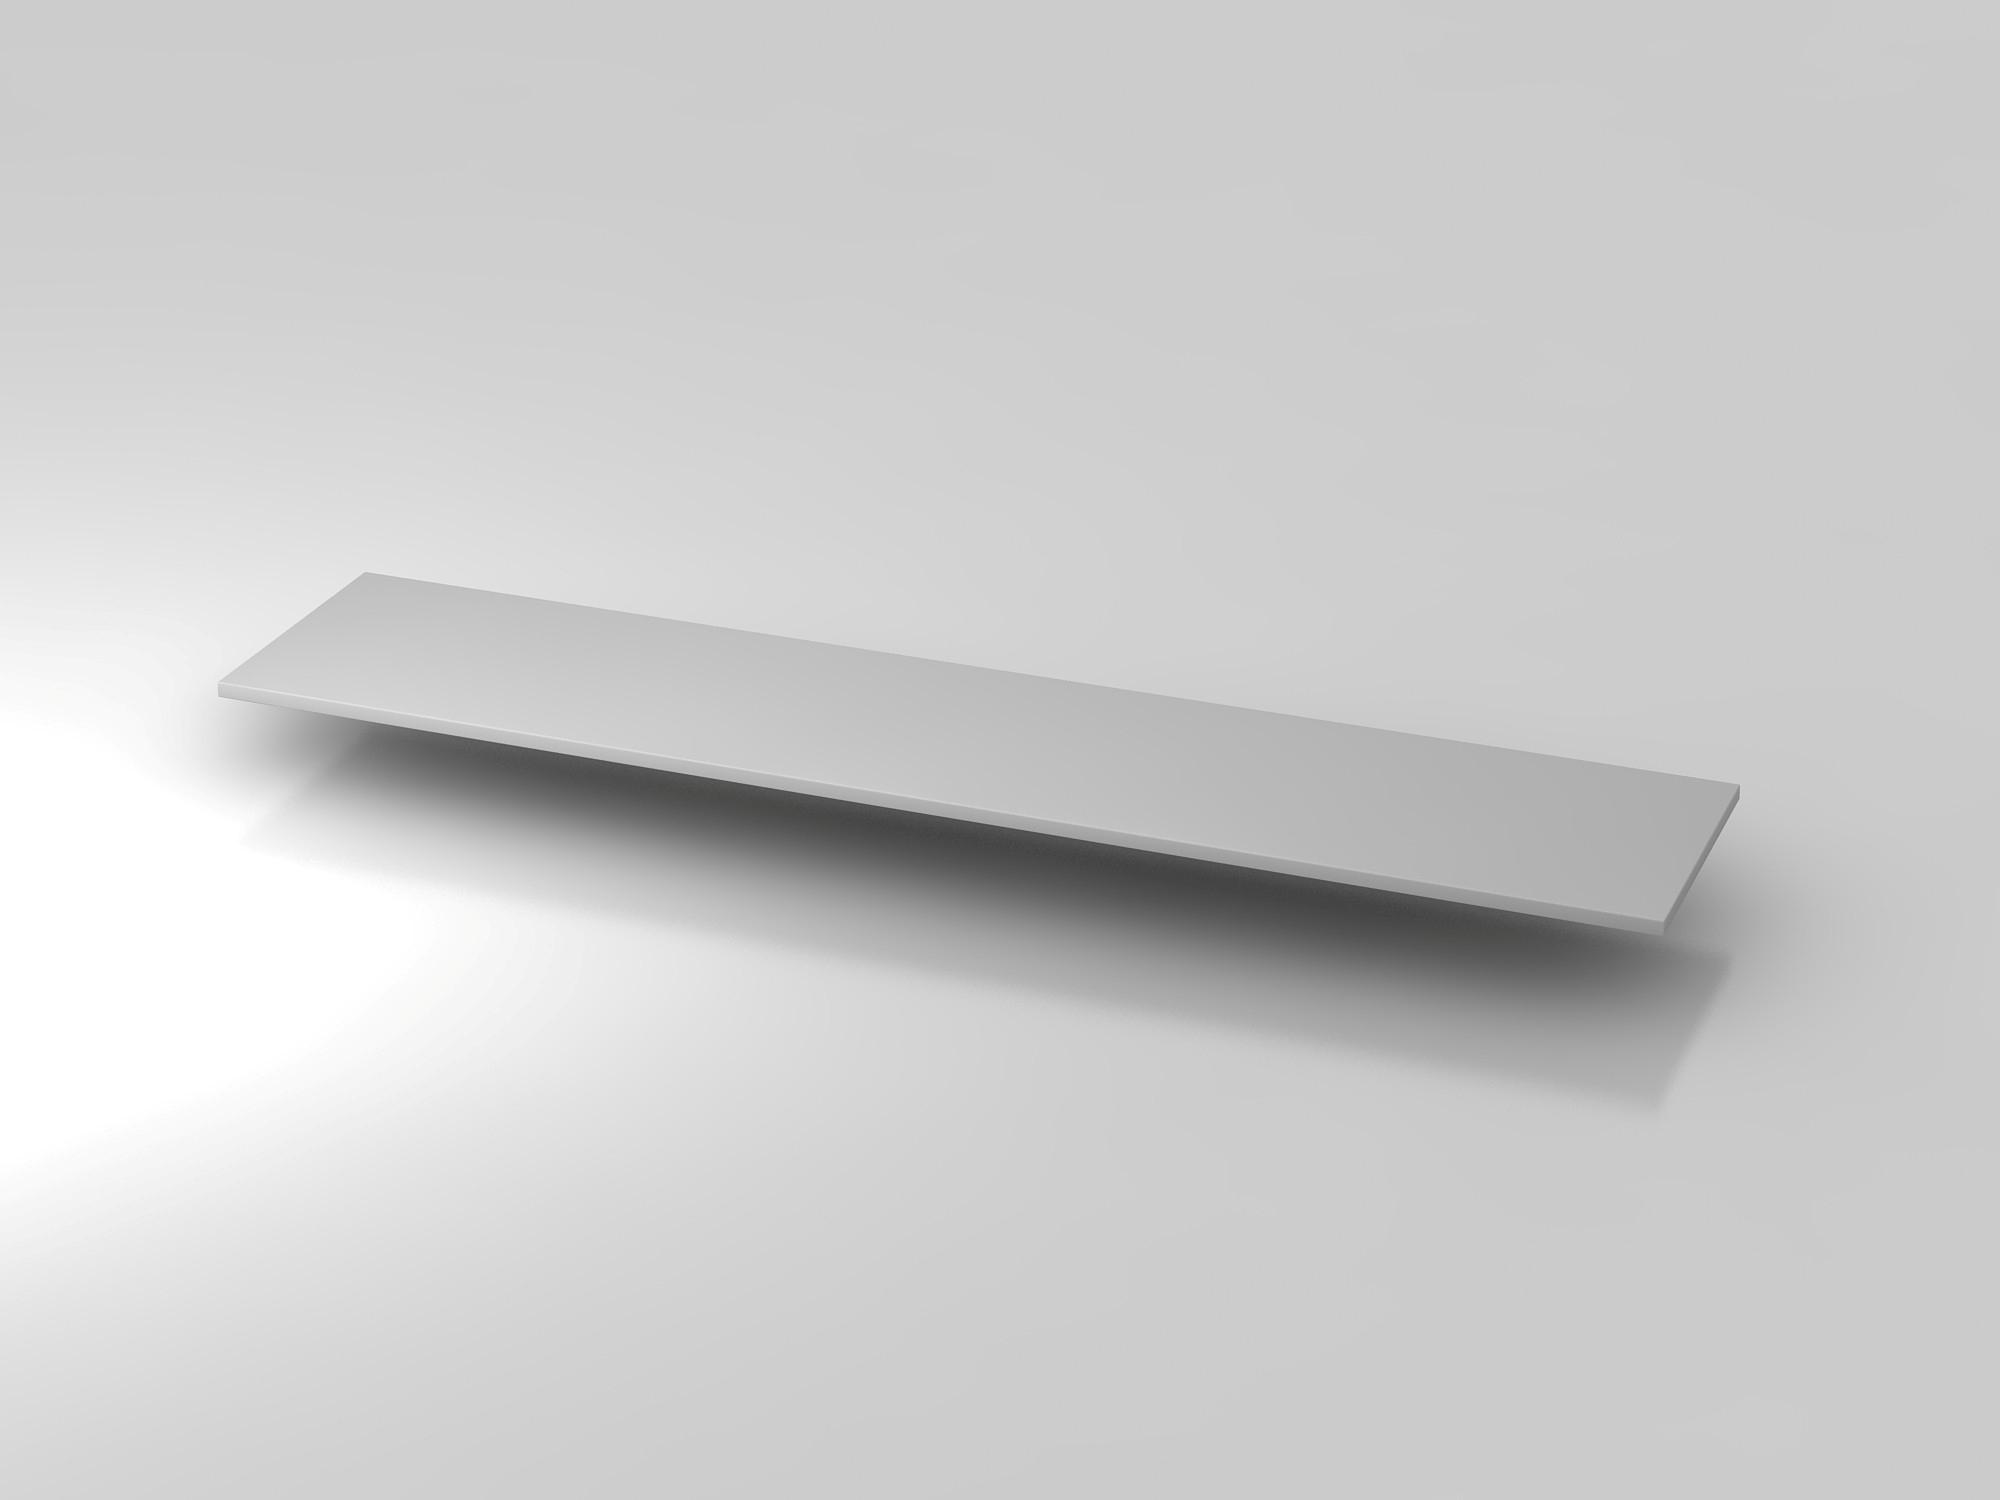 Abdeckplatte 200,5x43cm Grau